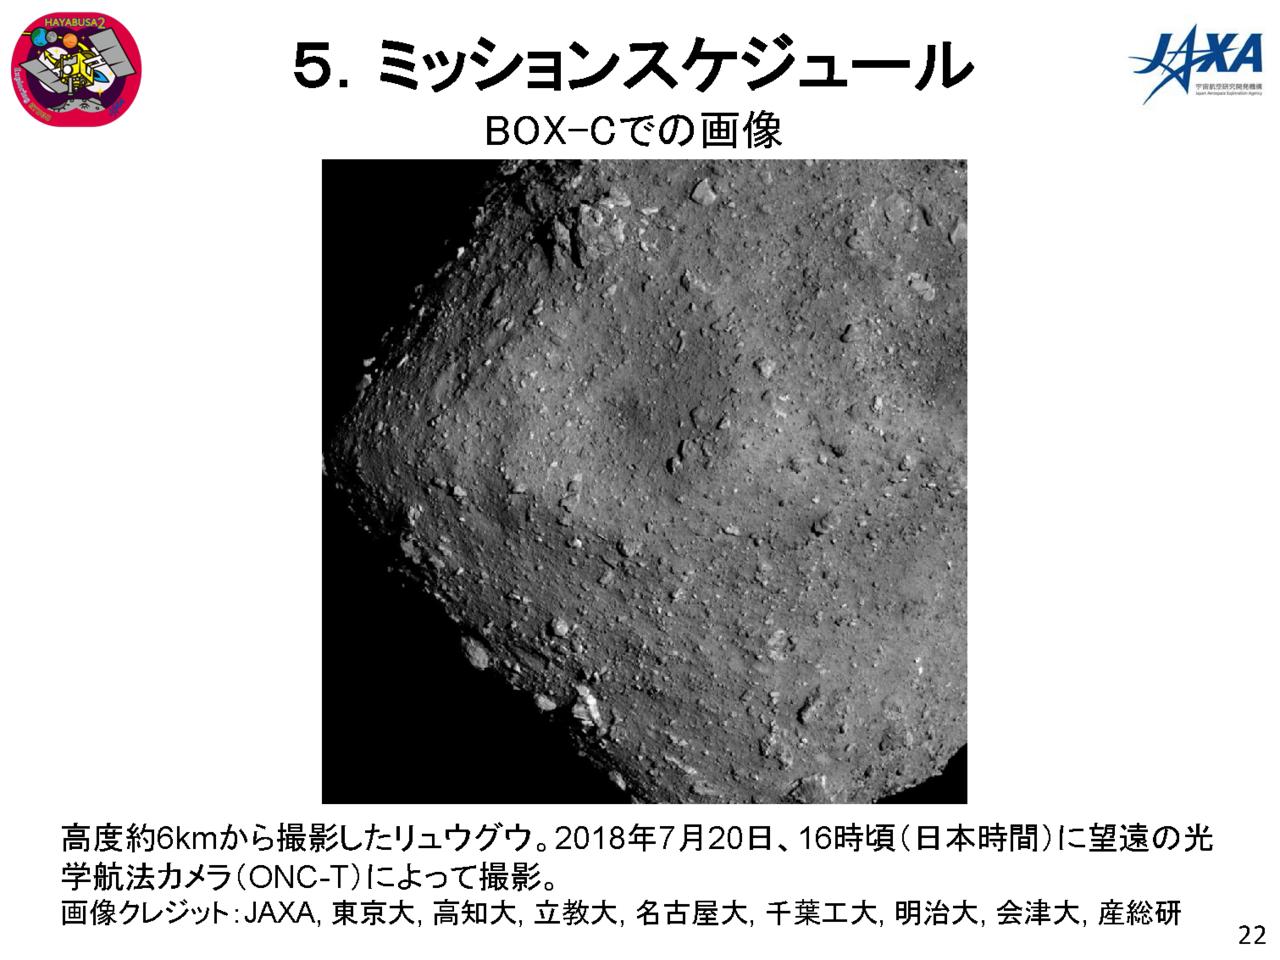 f:id:Imamura:20180802145942p:plain